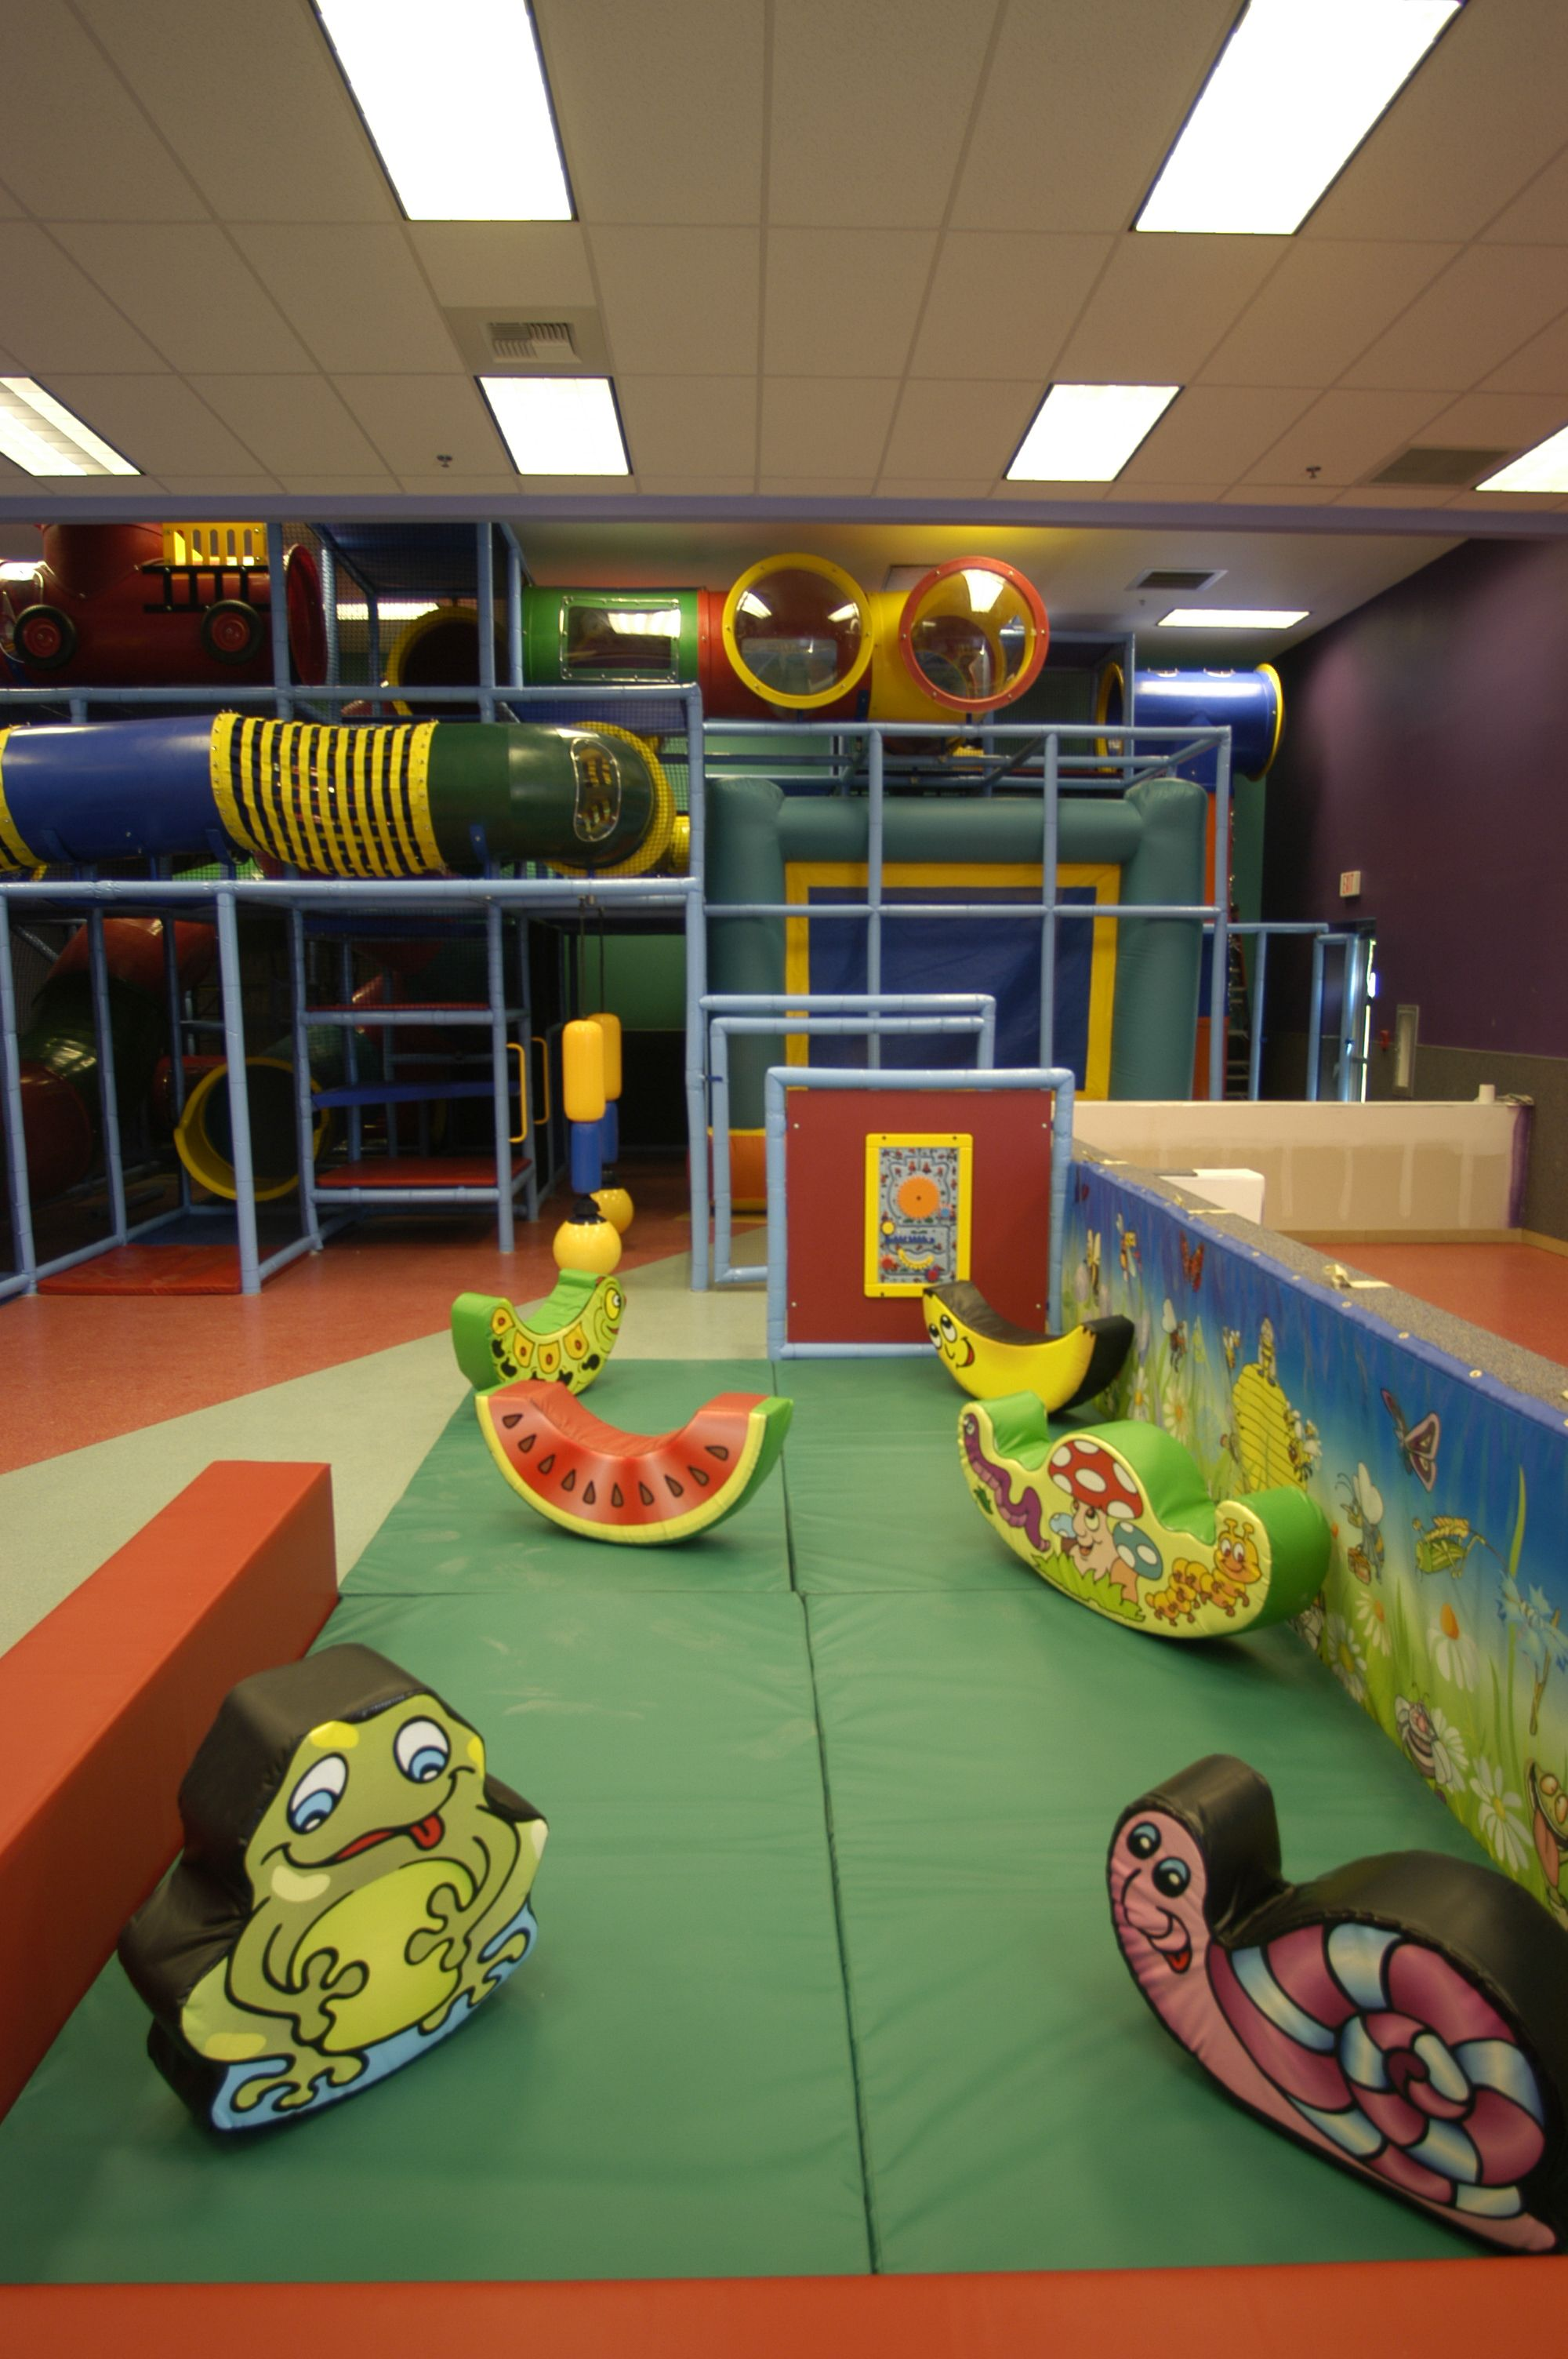 Ihram Kids For Sale Dubai: Installing Photo .... New Indoor Playground For The Bigger